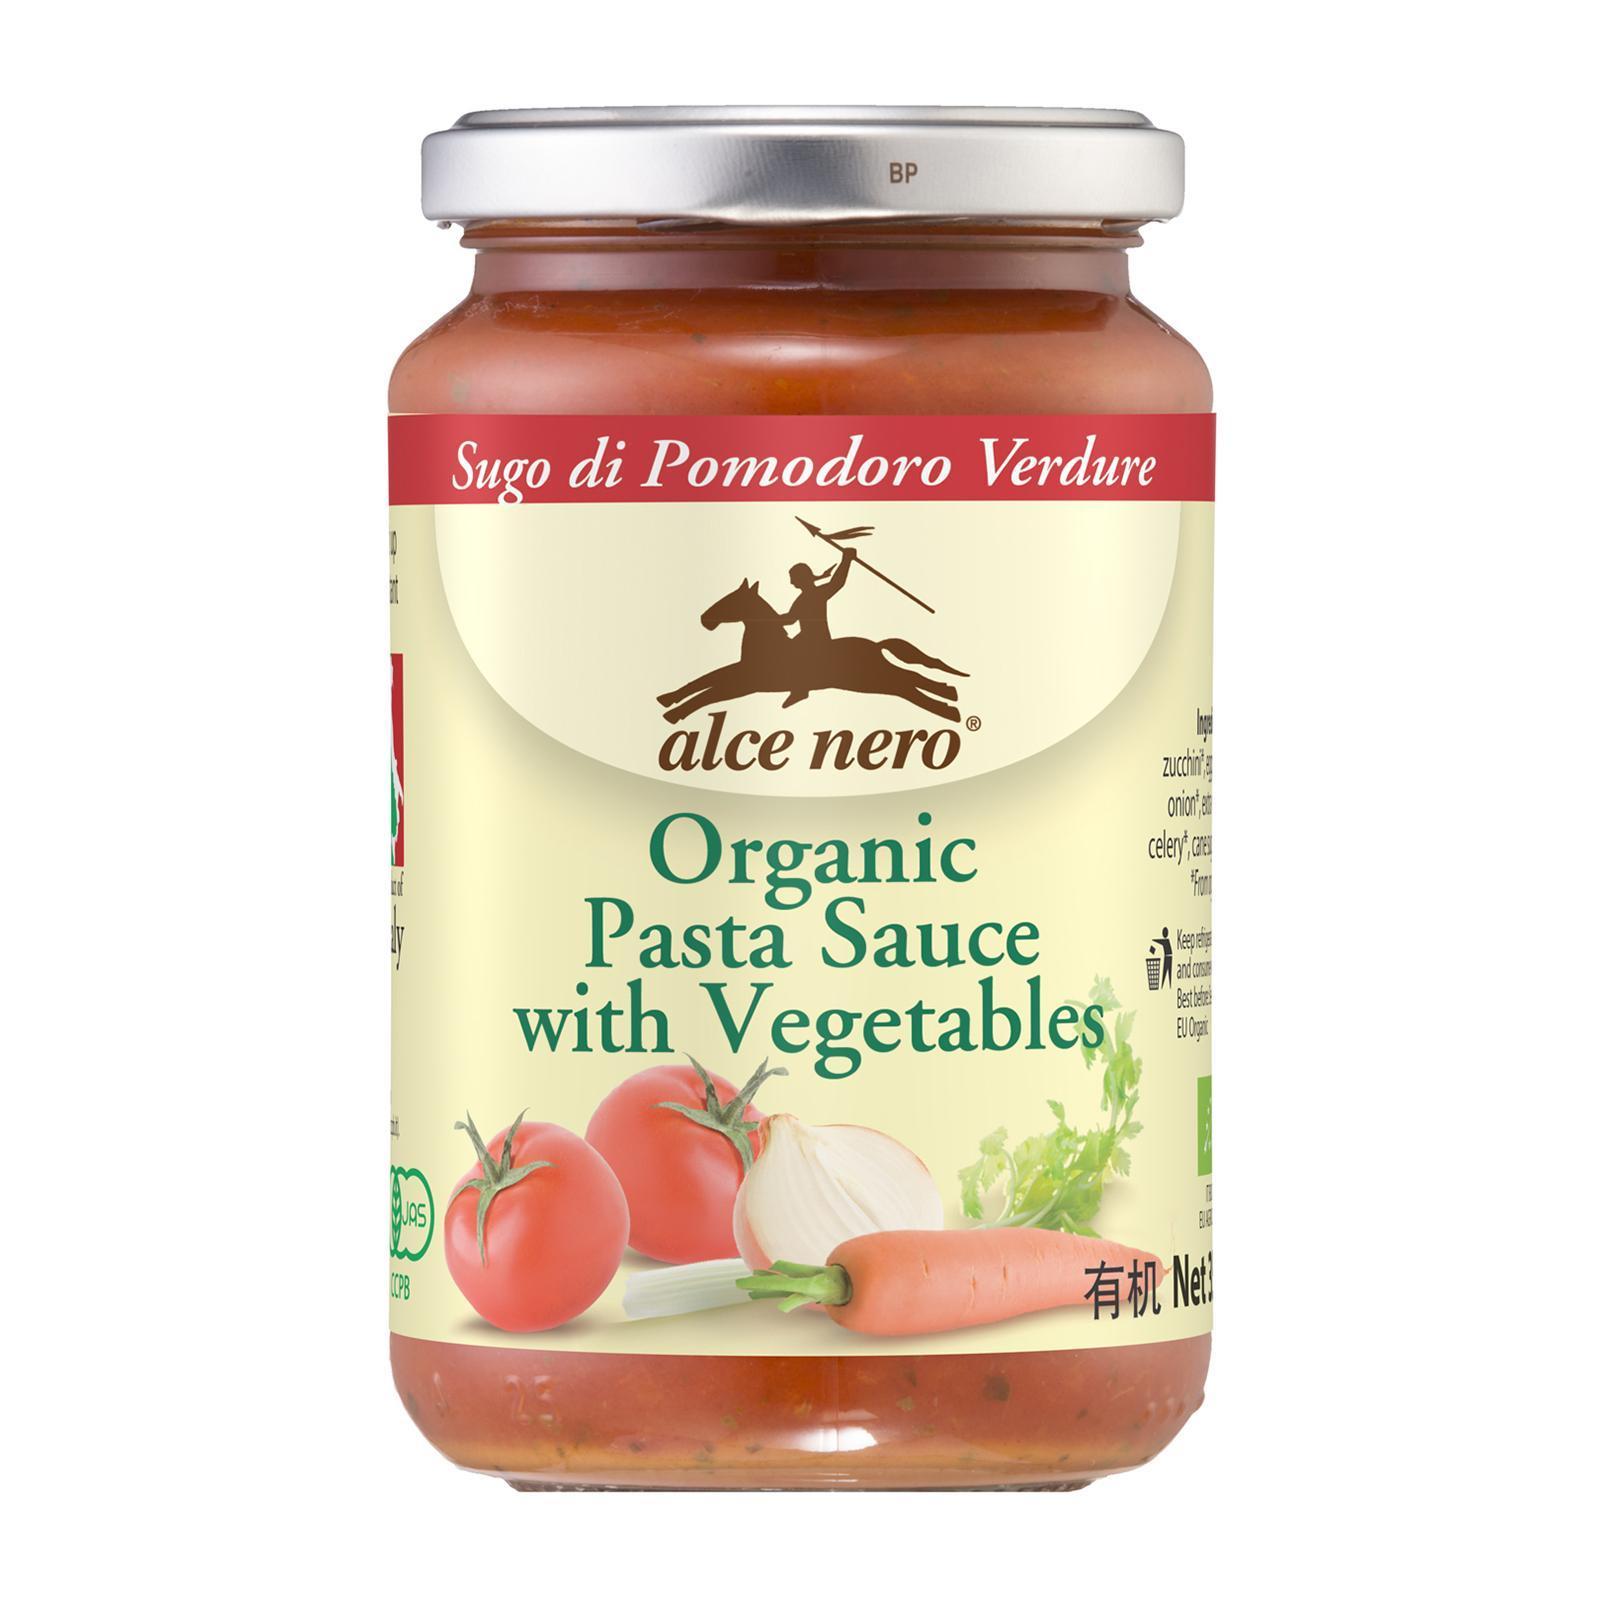 ALCE NERO Pasta Sauce Organic - Vegetables 350g